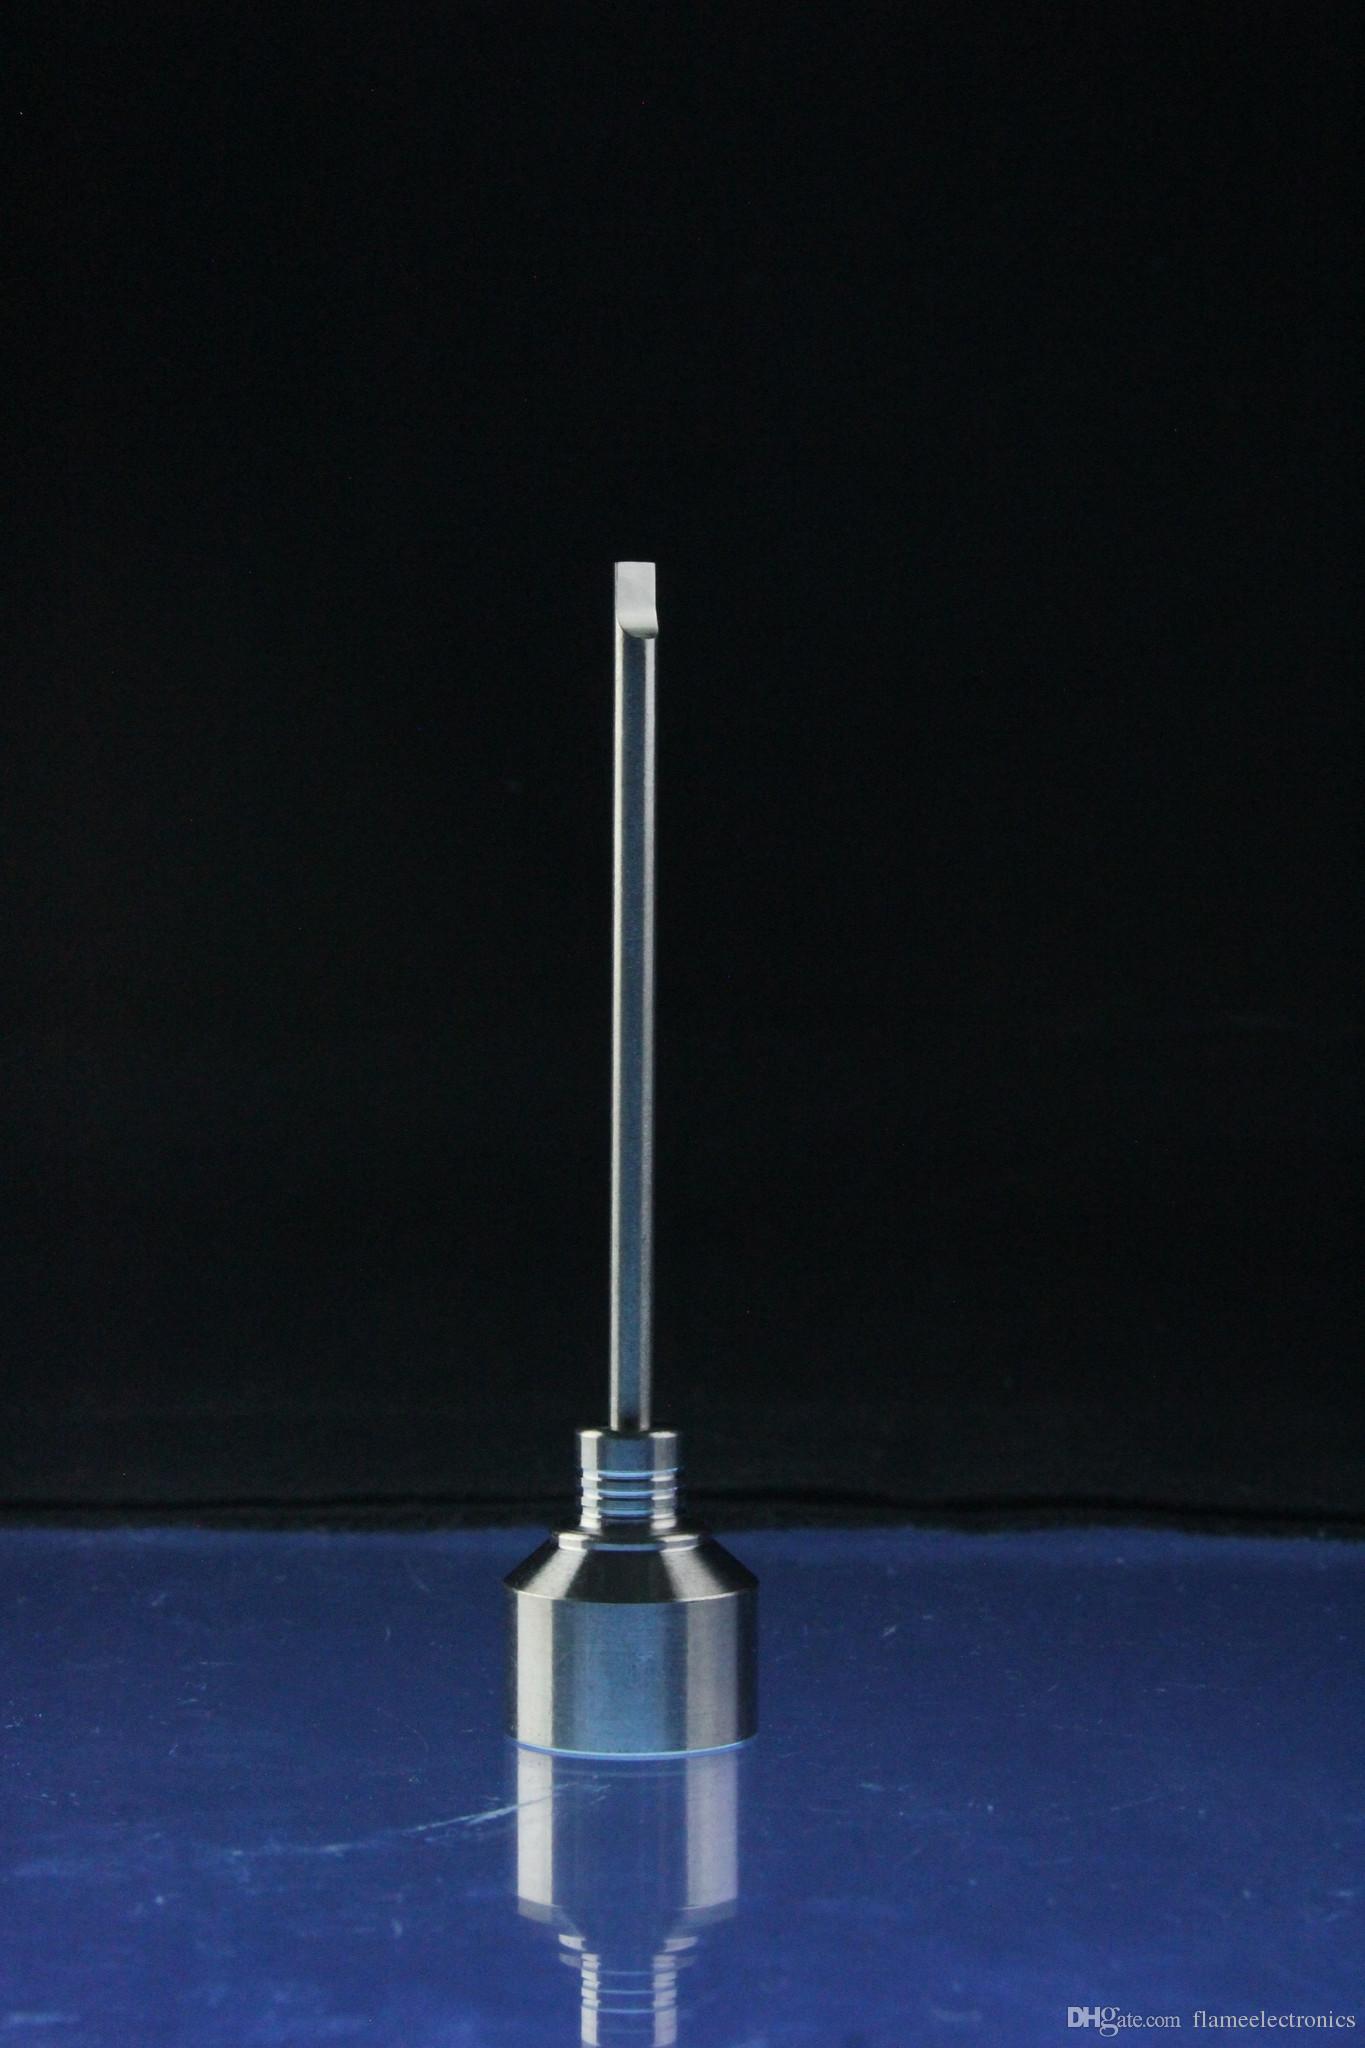 Титан карбюратора крышка инструмент 10мм 14мм 18мм domeless ногтей domeless Титан ногтей gr2 Титан ногтей оценка 2 Титана Ti ногтей для стекла Бонг